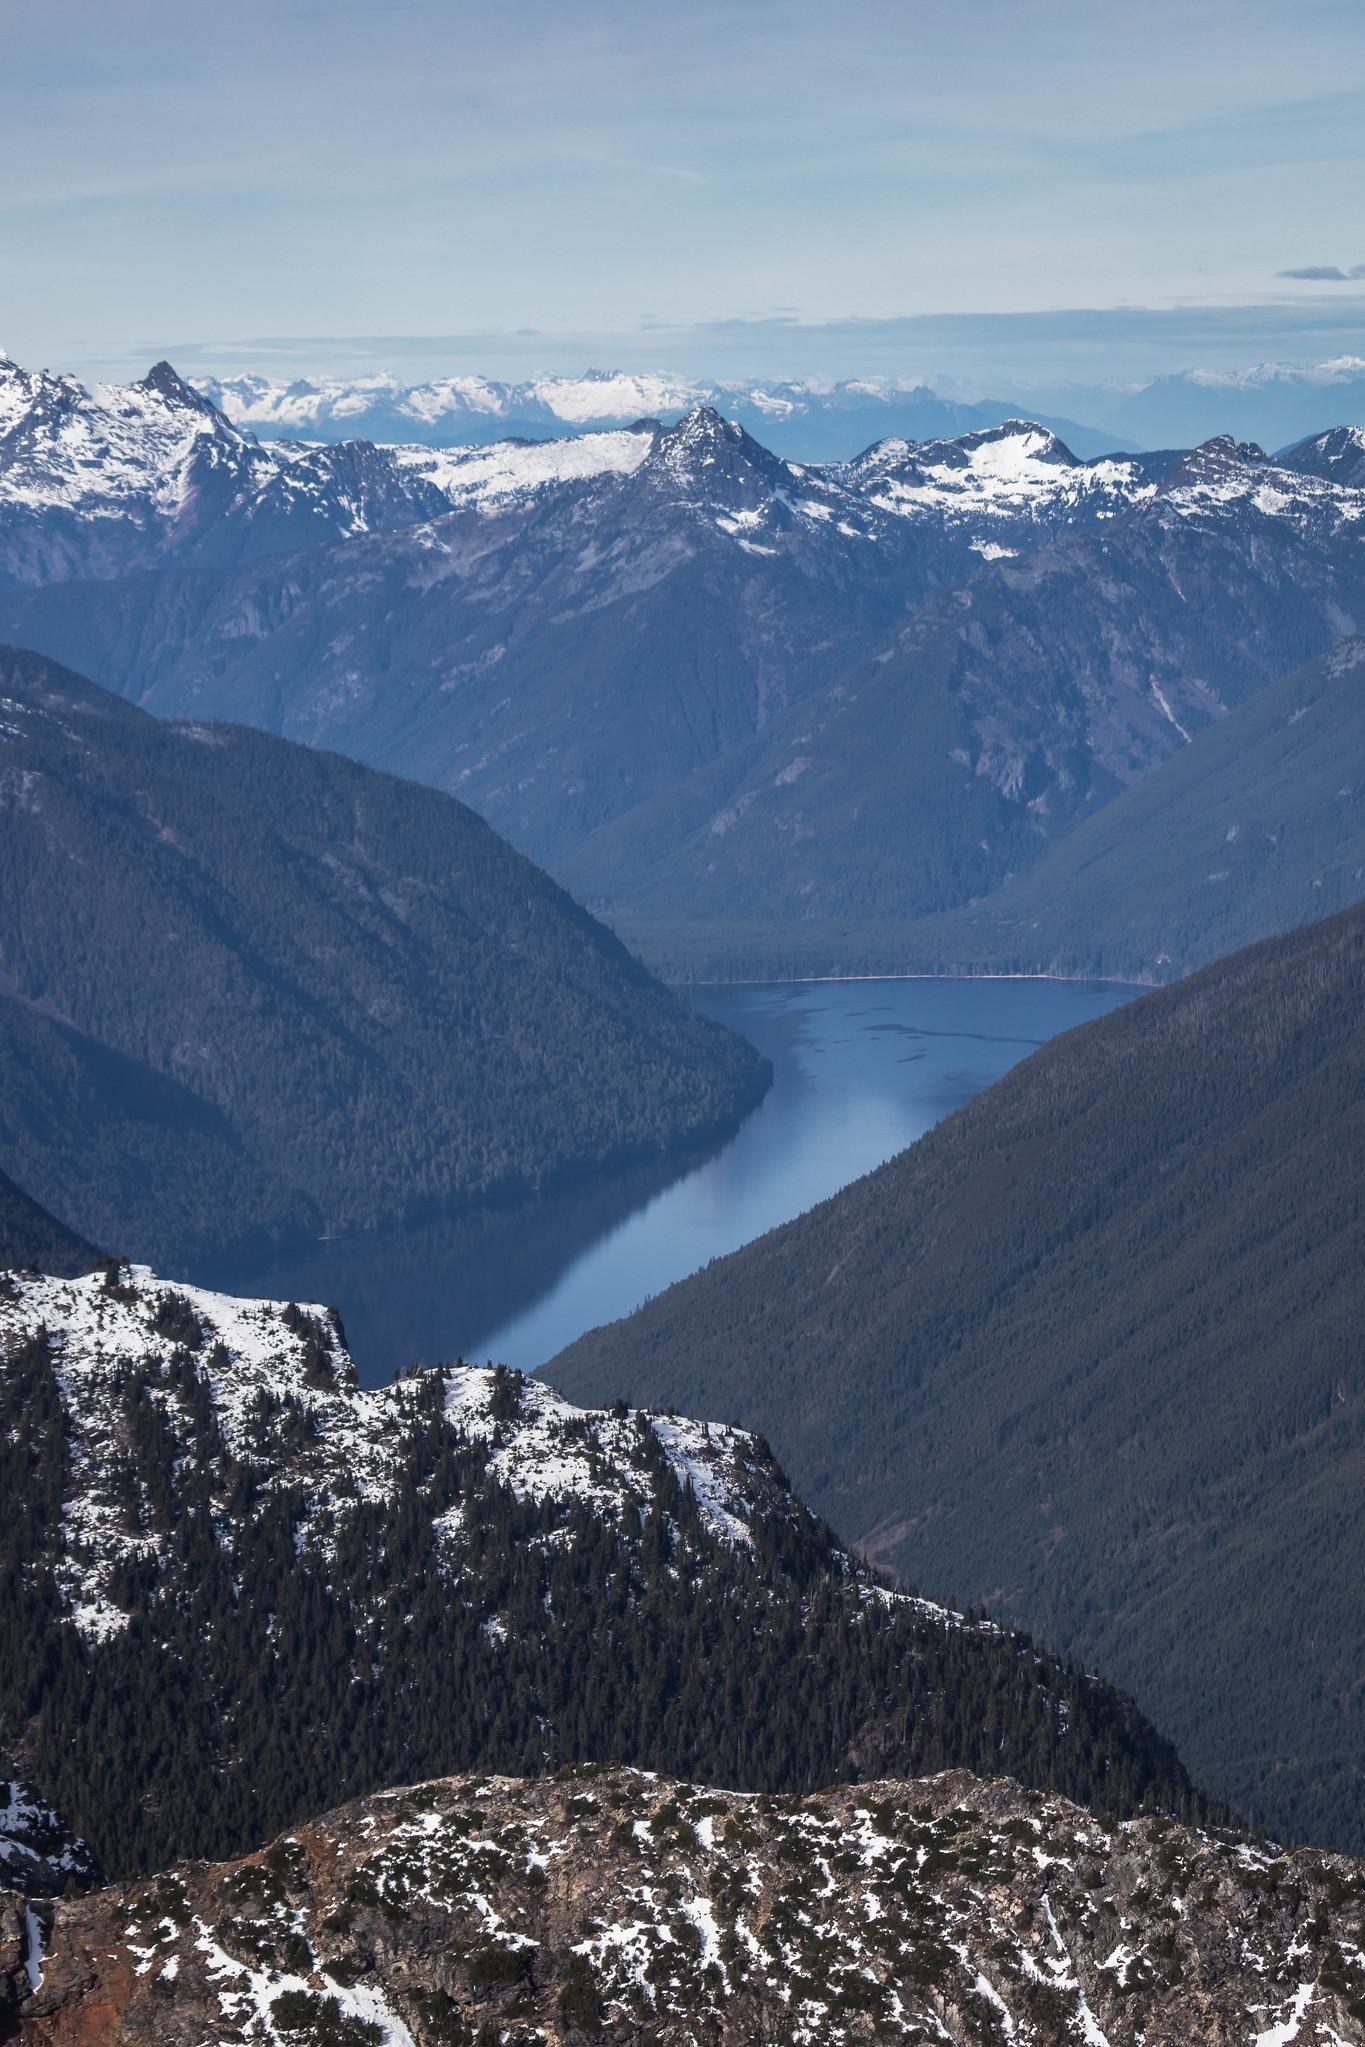 Chilliwack Lake from below Mad Eagle Peak